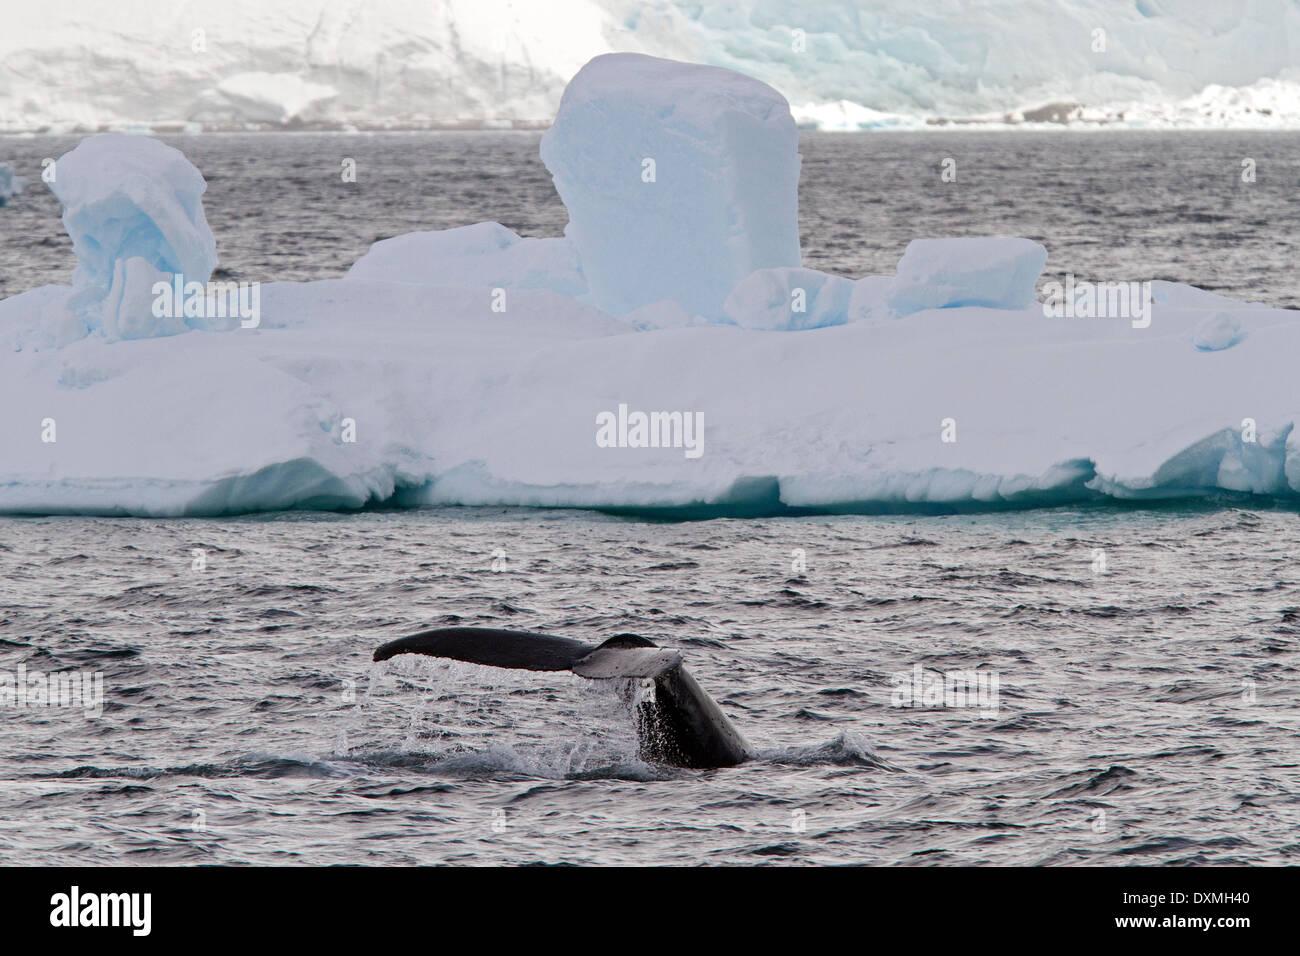 Antarctica whales, Humpback whales Antarctic, Megaptera novaeangliae. Whale flukes with iceberg. - Stock Image